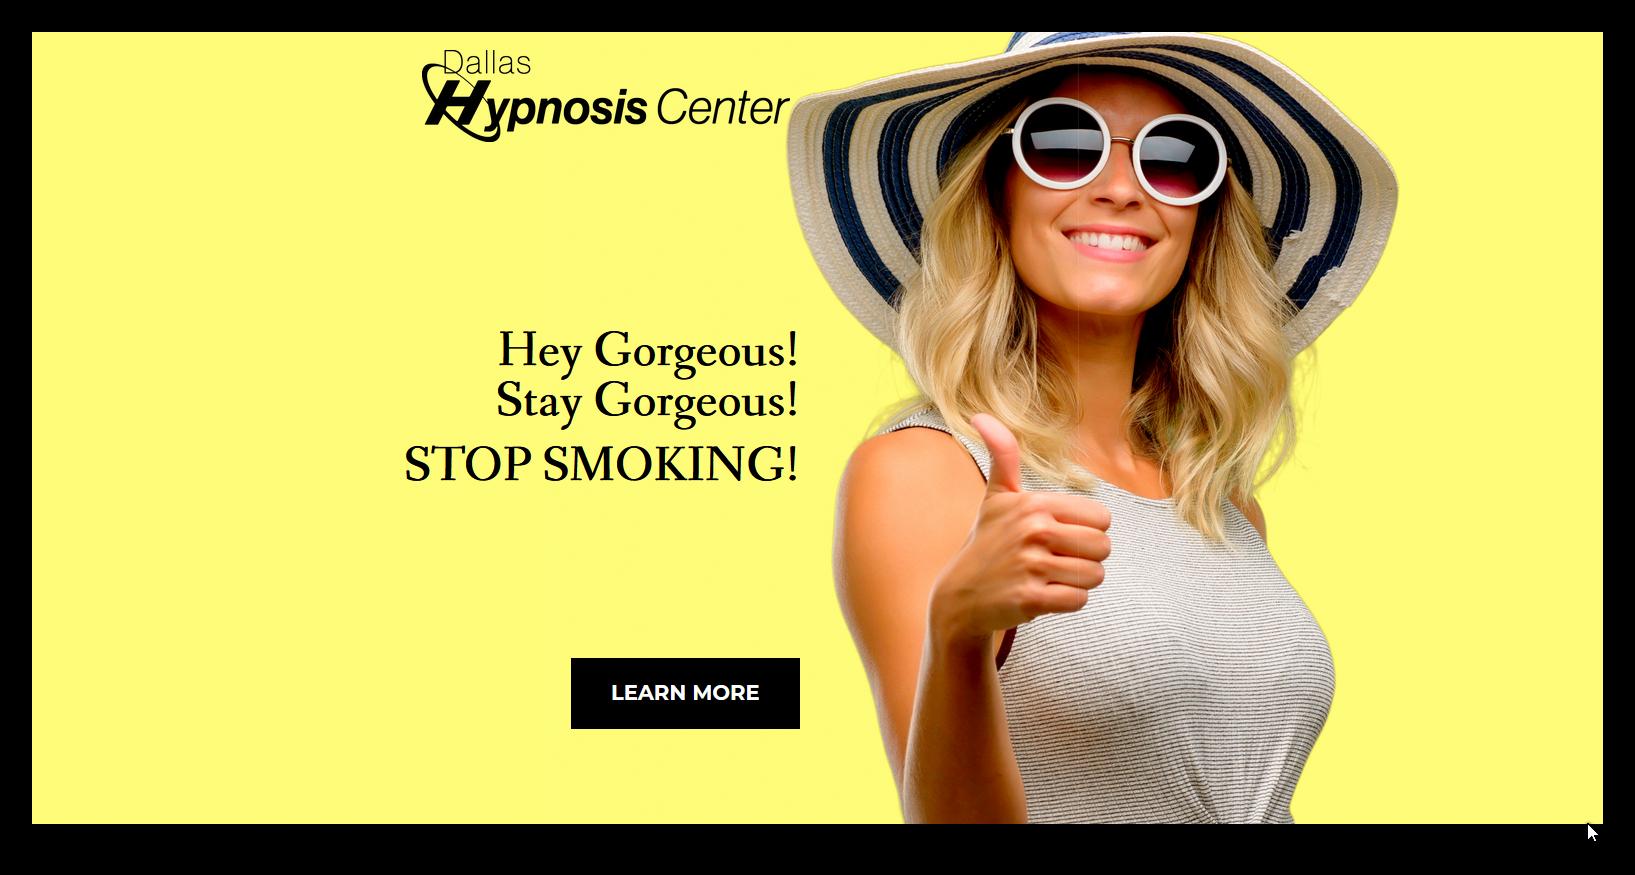 Hey Gorgeous!Stay Gorgeous! Stop Smoking!